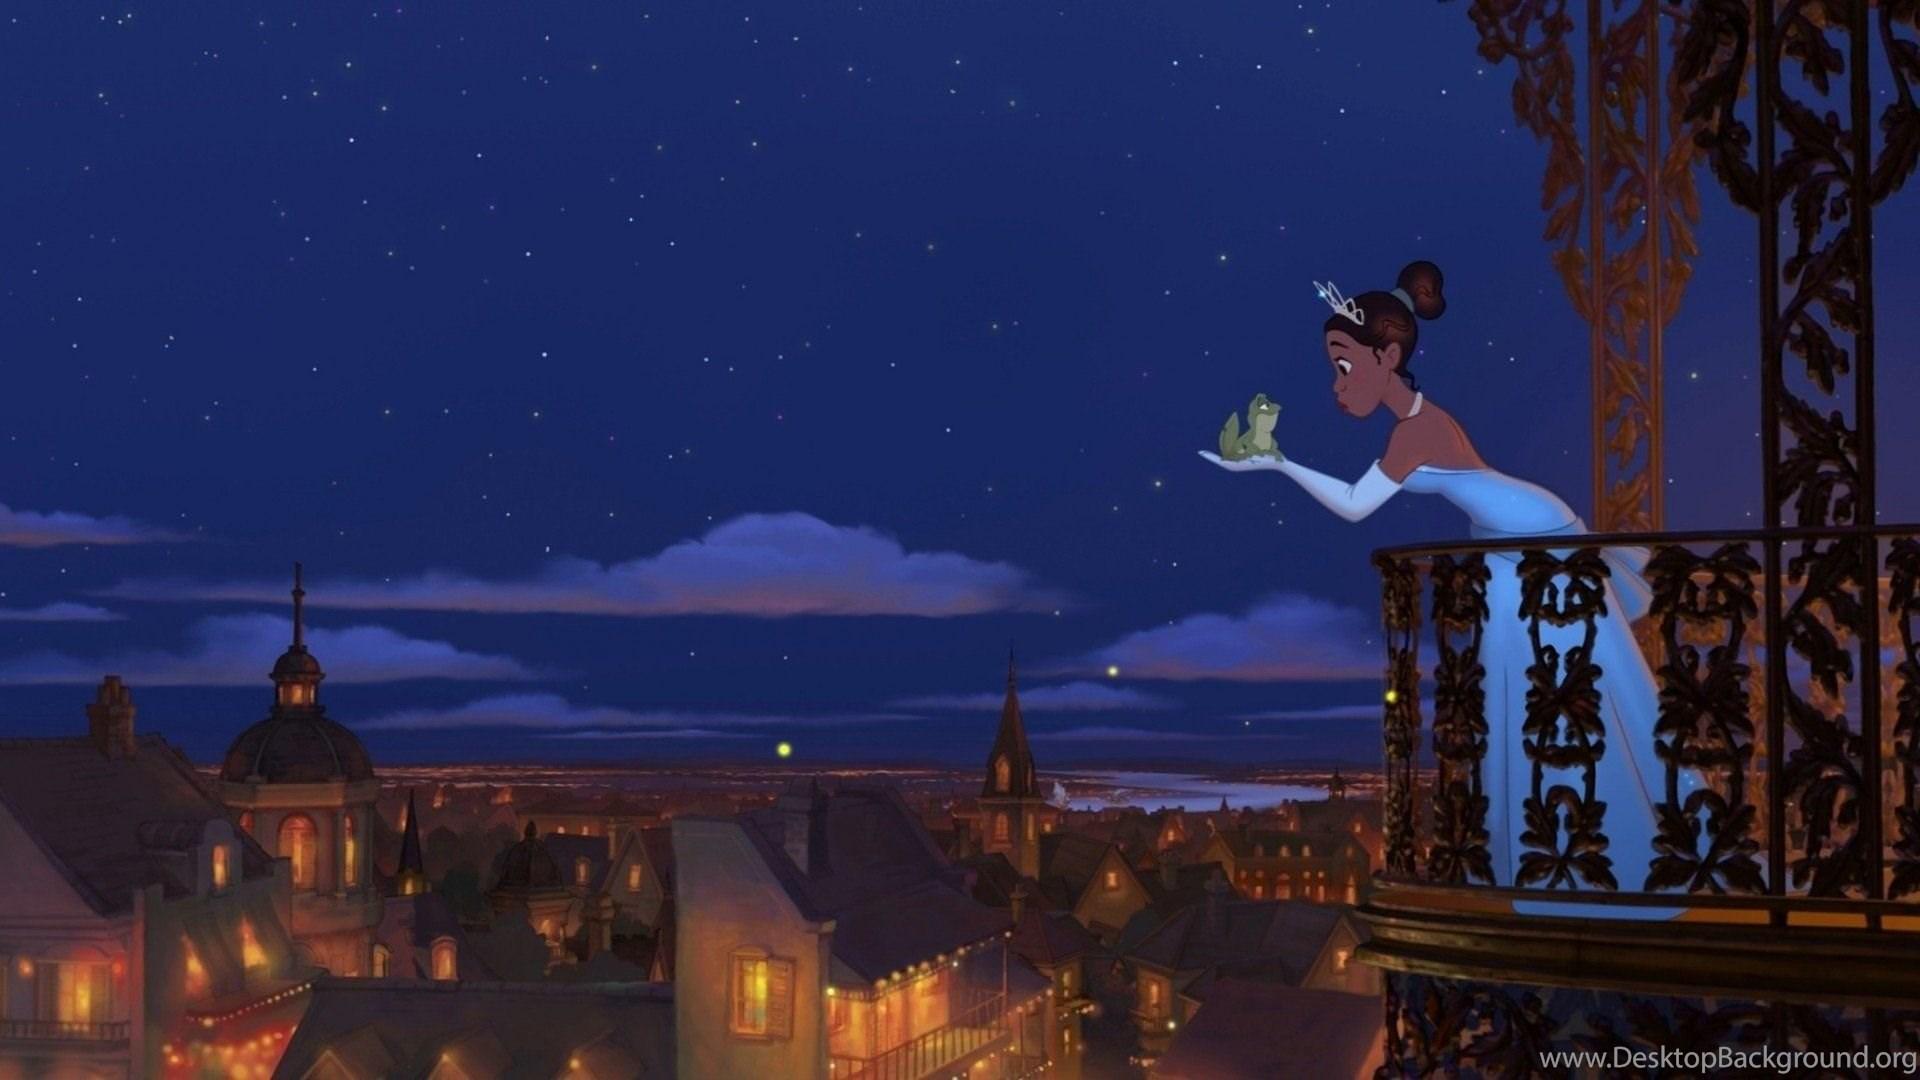 Cartoons Frog Tiana The Princess And The Frog Disney Wallpapers